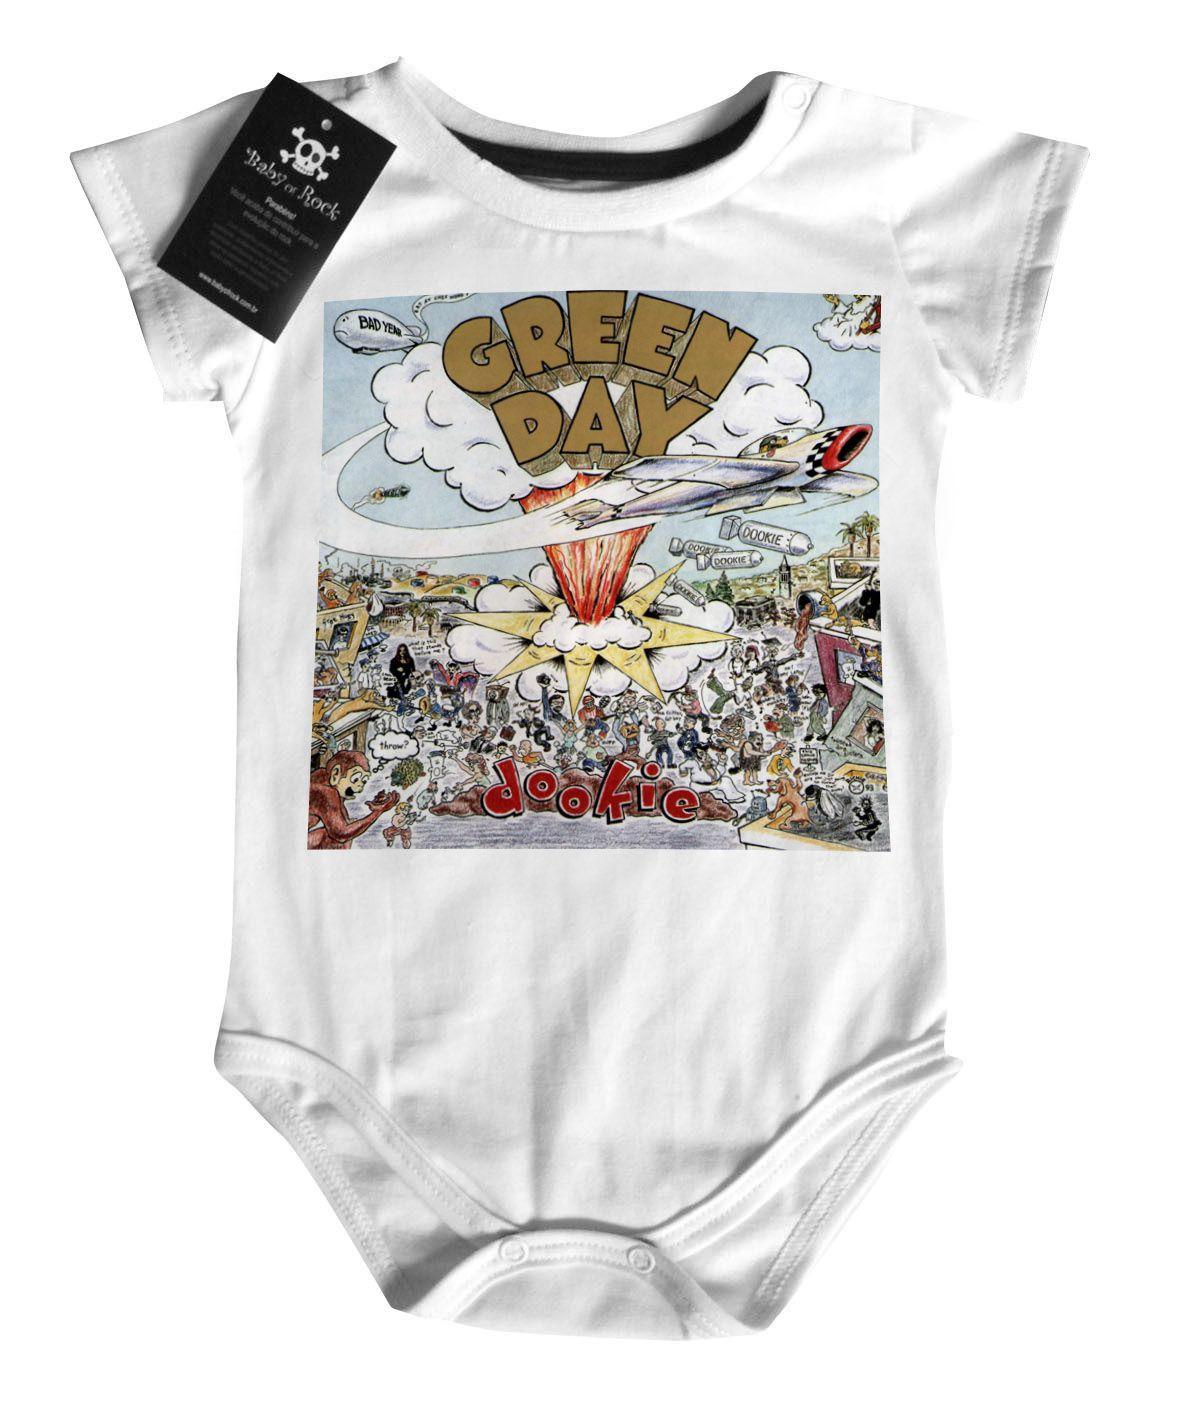 Body Bebe  Rock  Green Day - White  - Baby Monster S/A